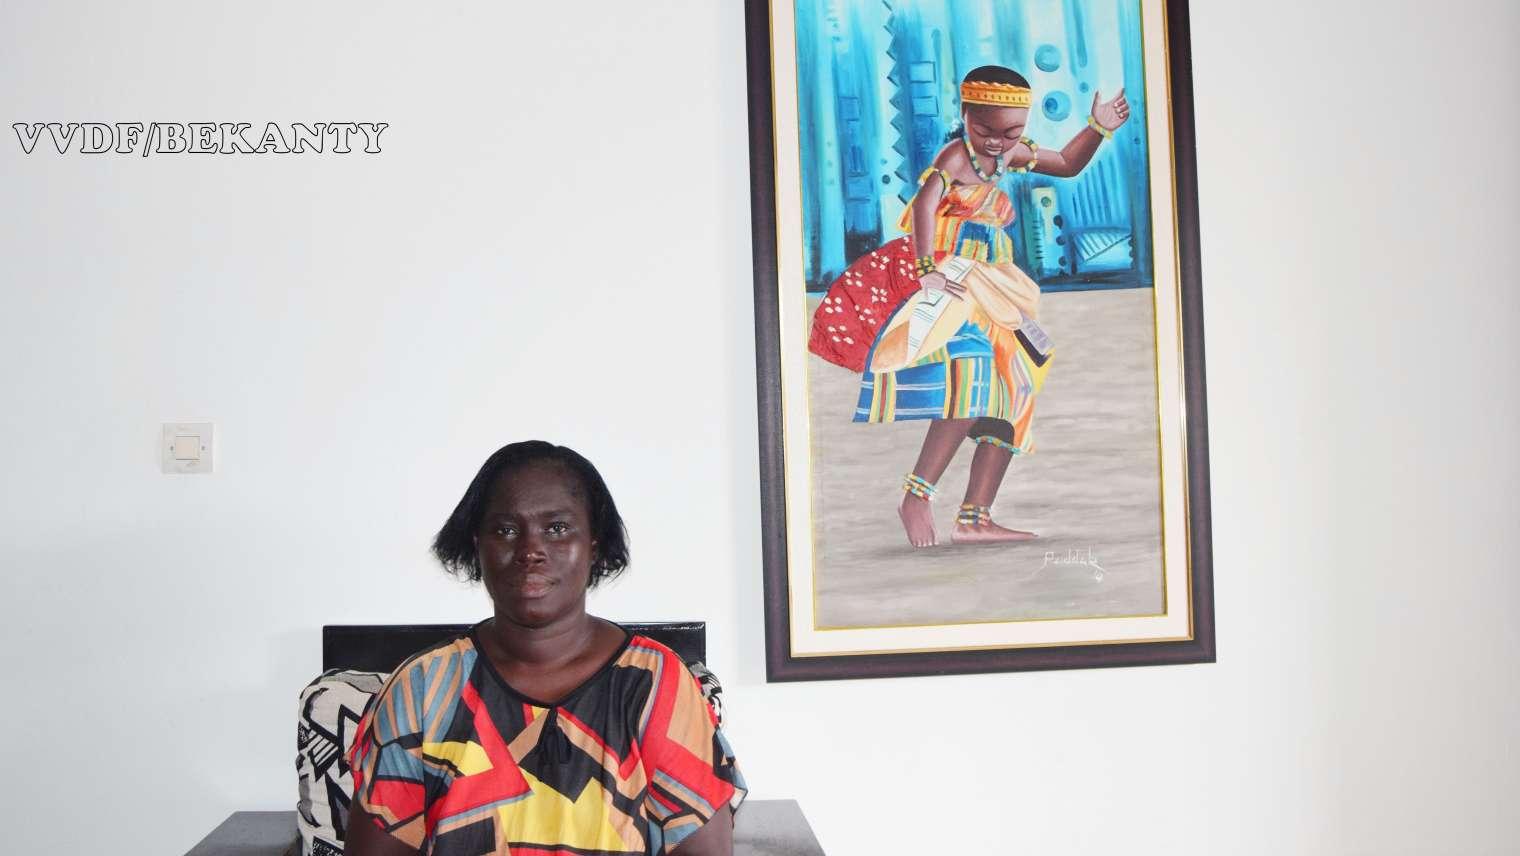 Culture akan : quand le lavage ''Ba Kékan'' transforme la jeune fille